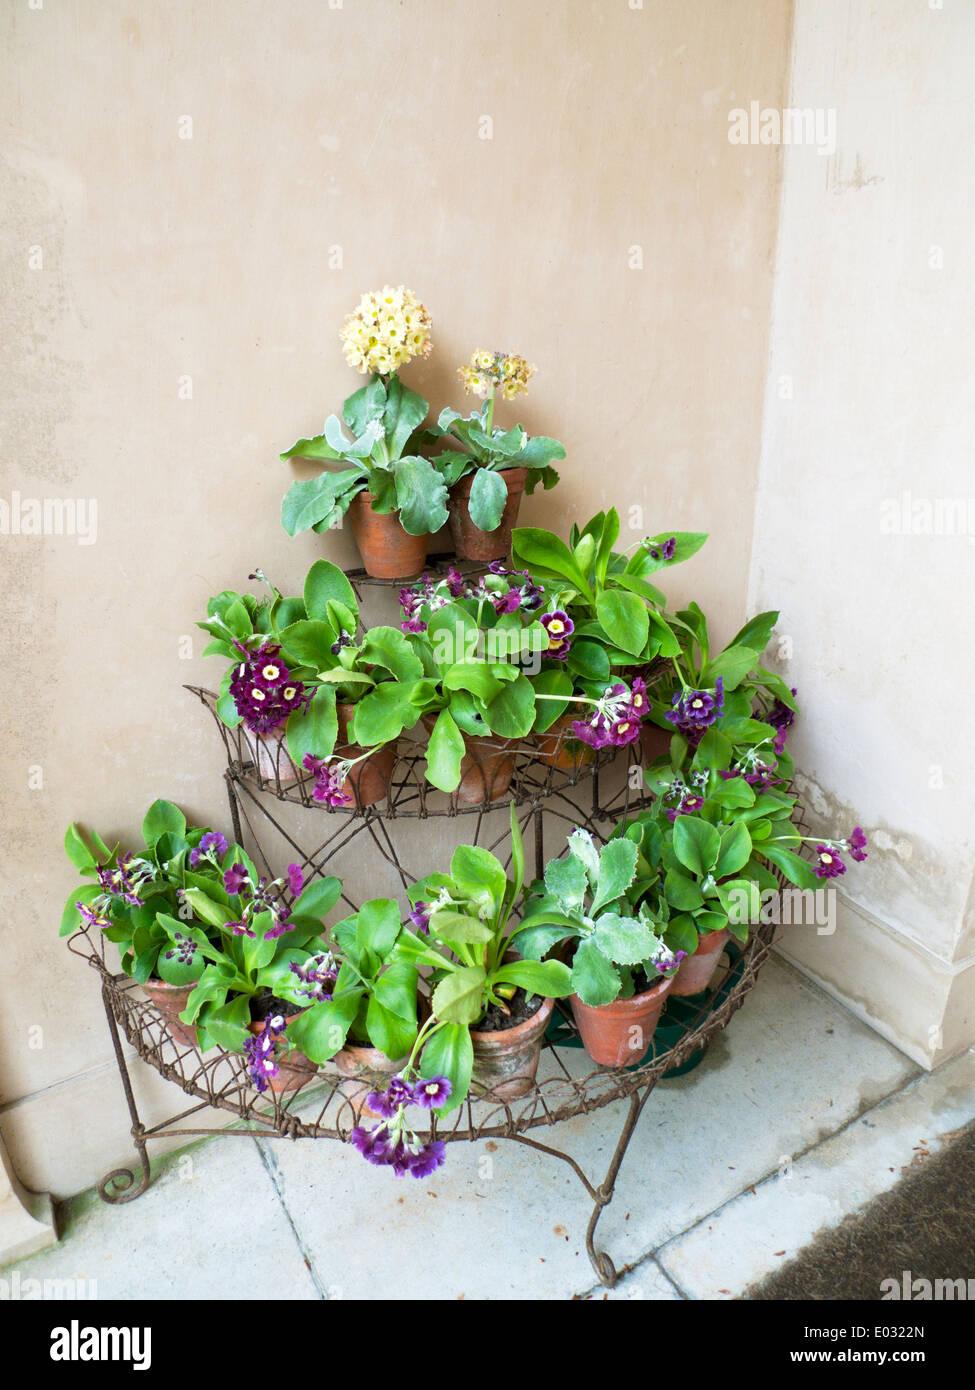 polyanthus plants in a victorian wire plant stand holder at ceredigion wales uk kathy dewitt